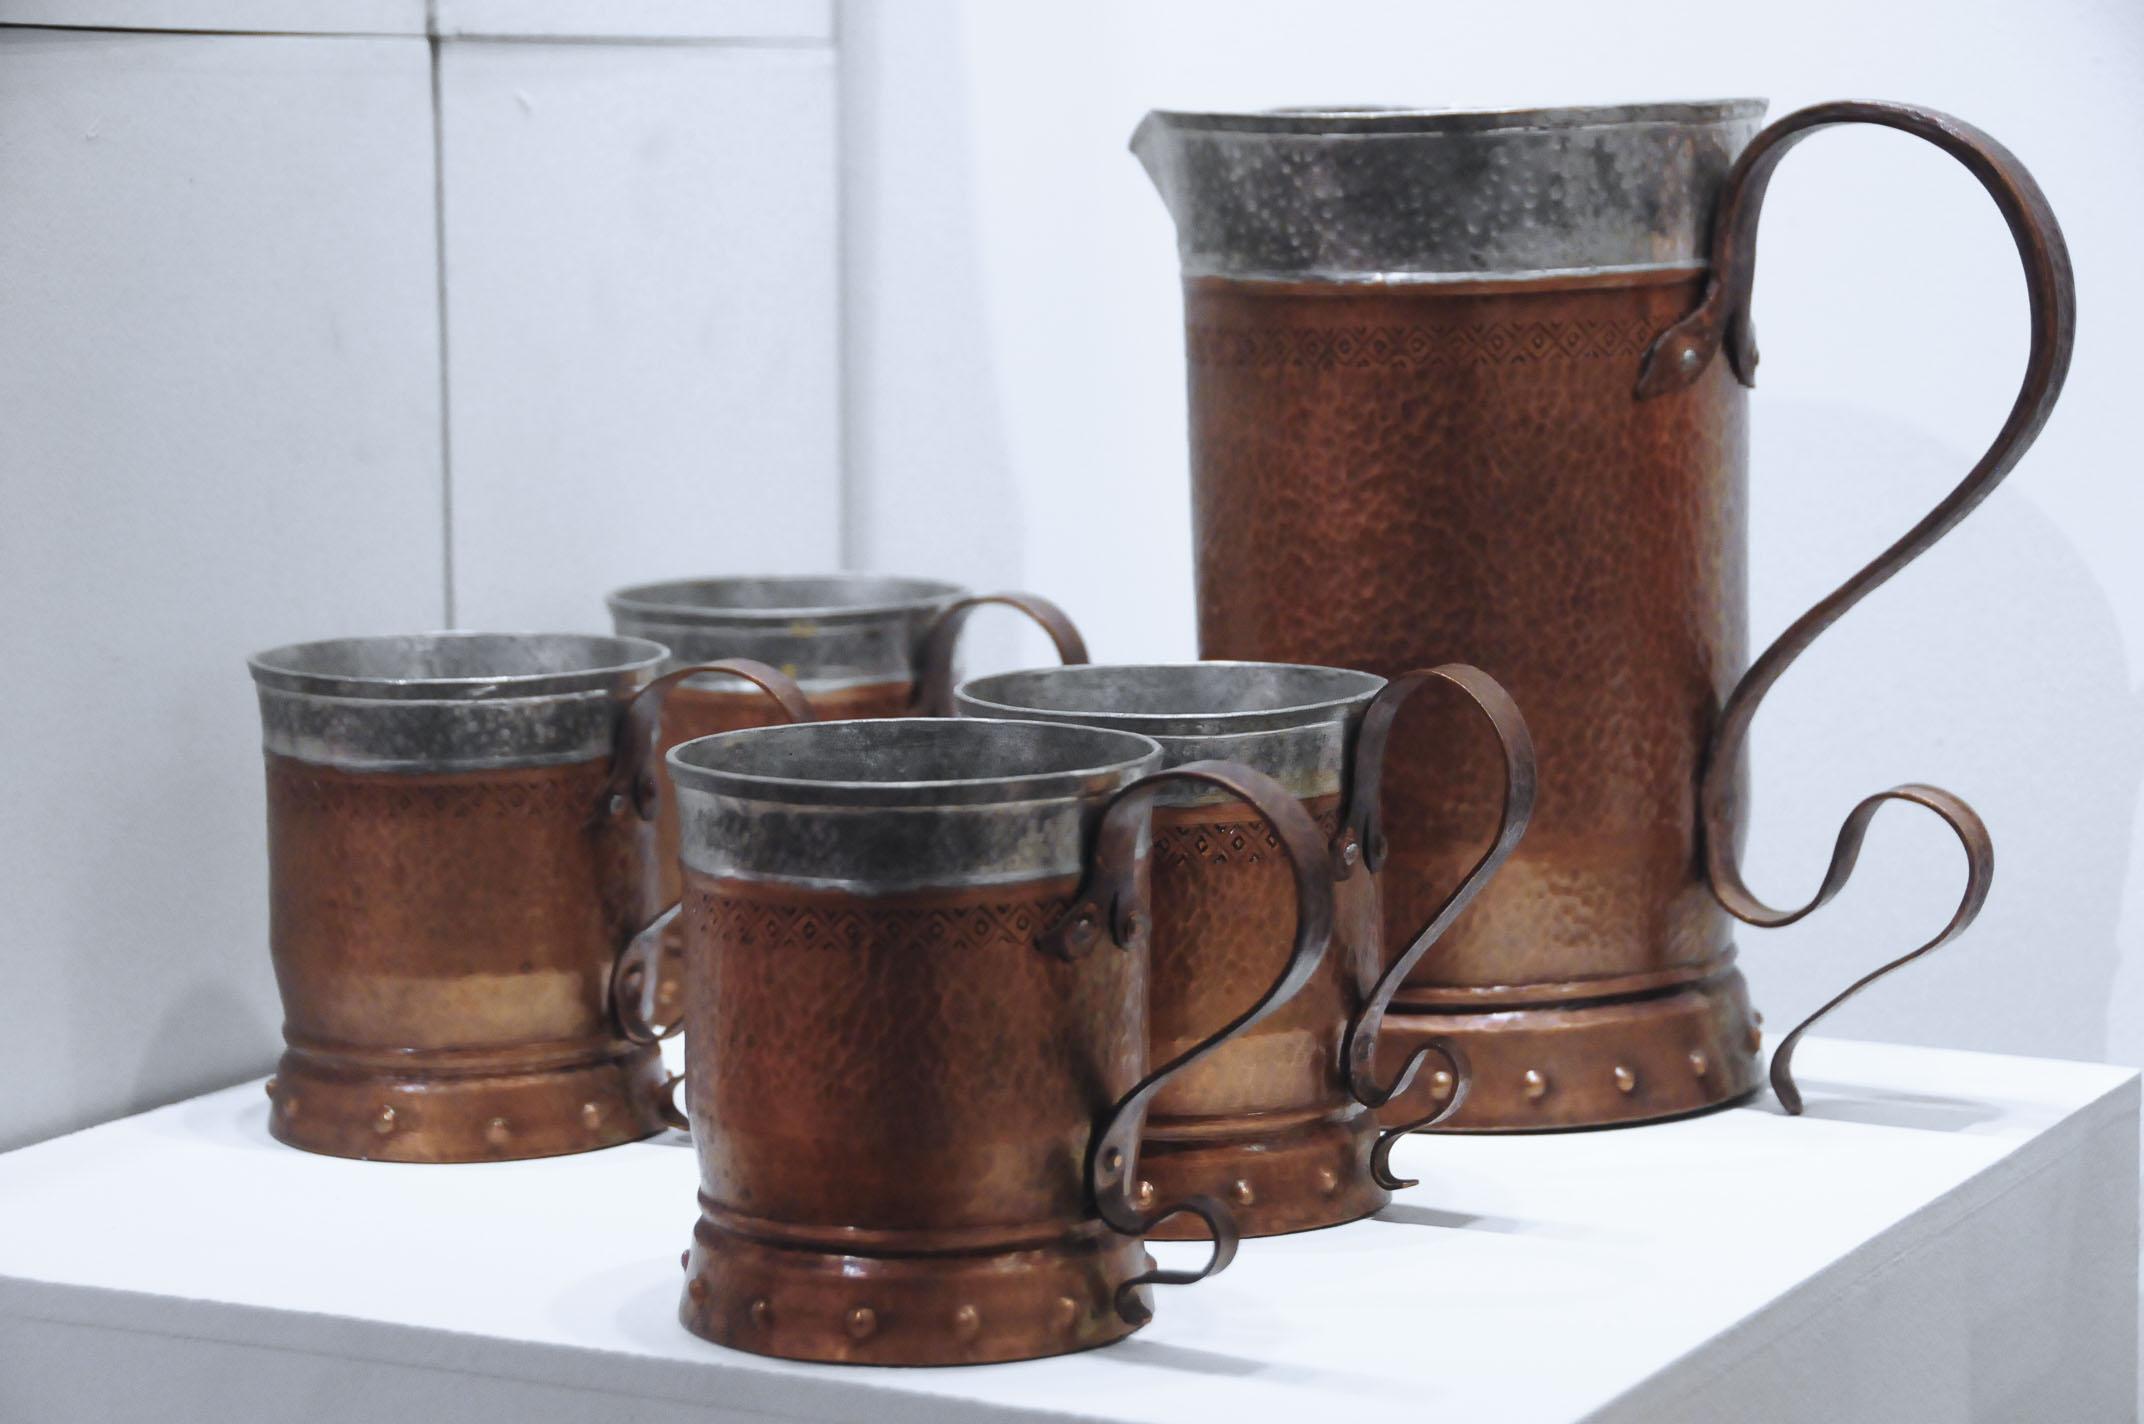 troyan-museum-mednikarstvo-ot-troyanskiq-krai-13